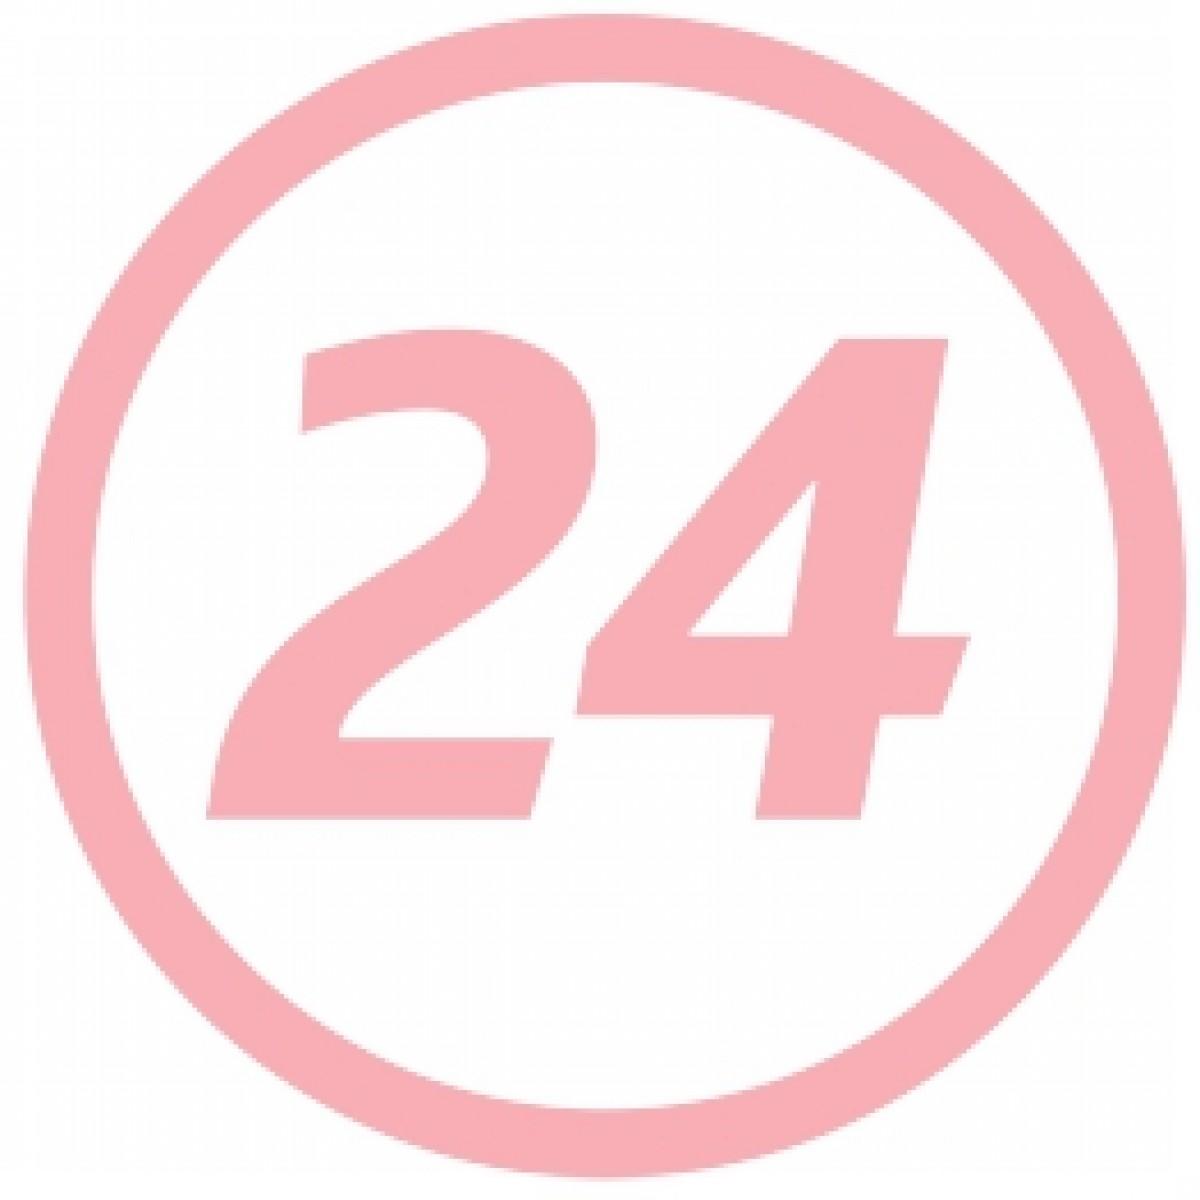 Vichy Tratament Crema Anti-Transpiratie 7 zile, Crema, 30ml